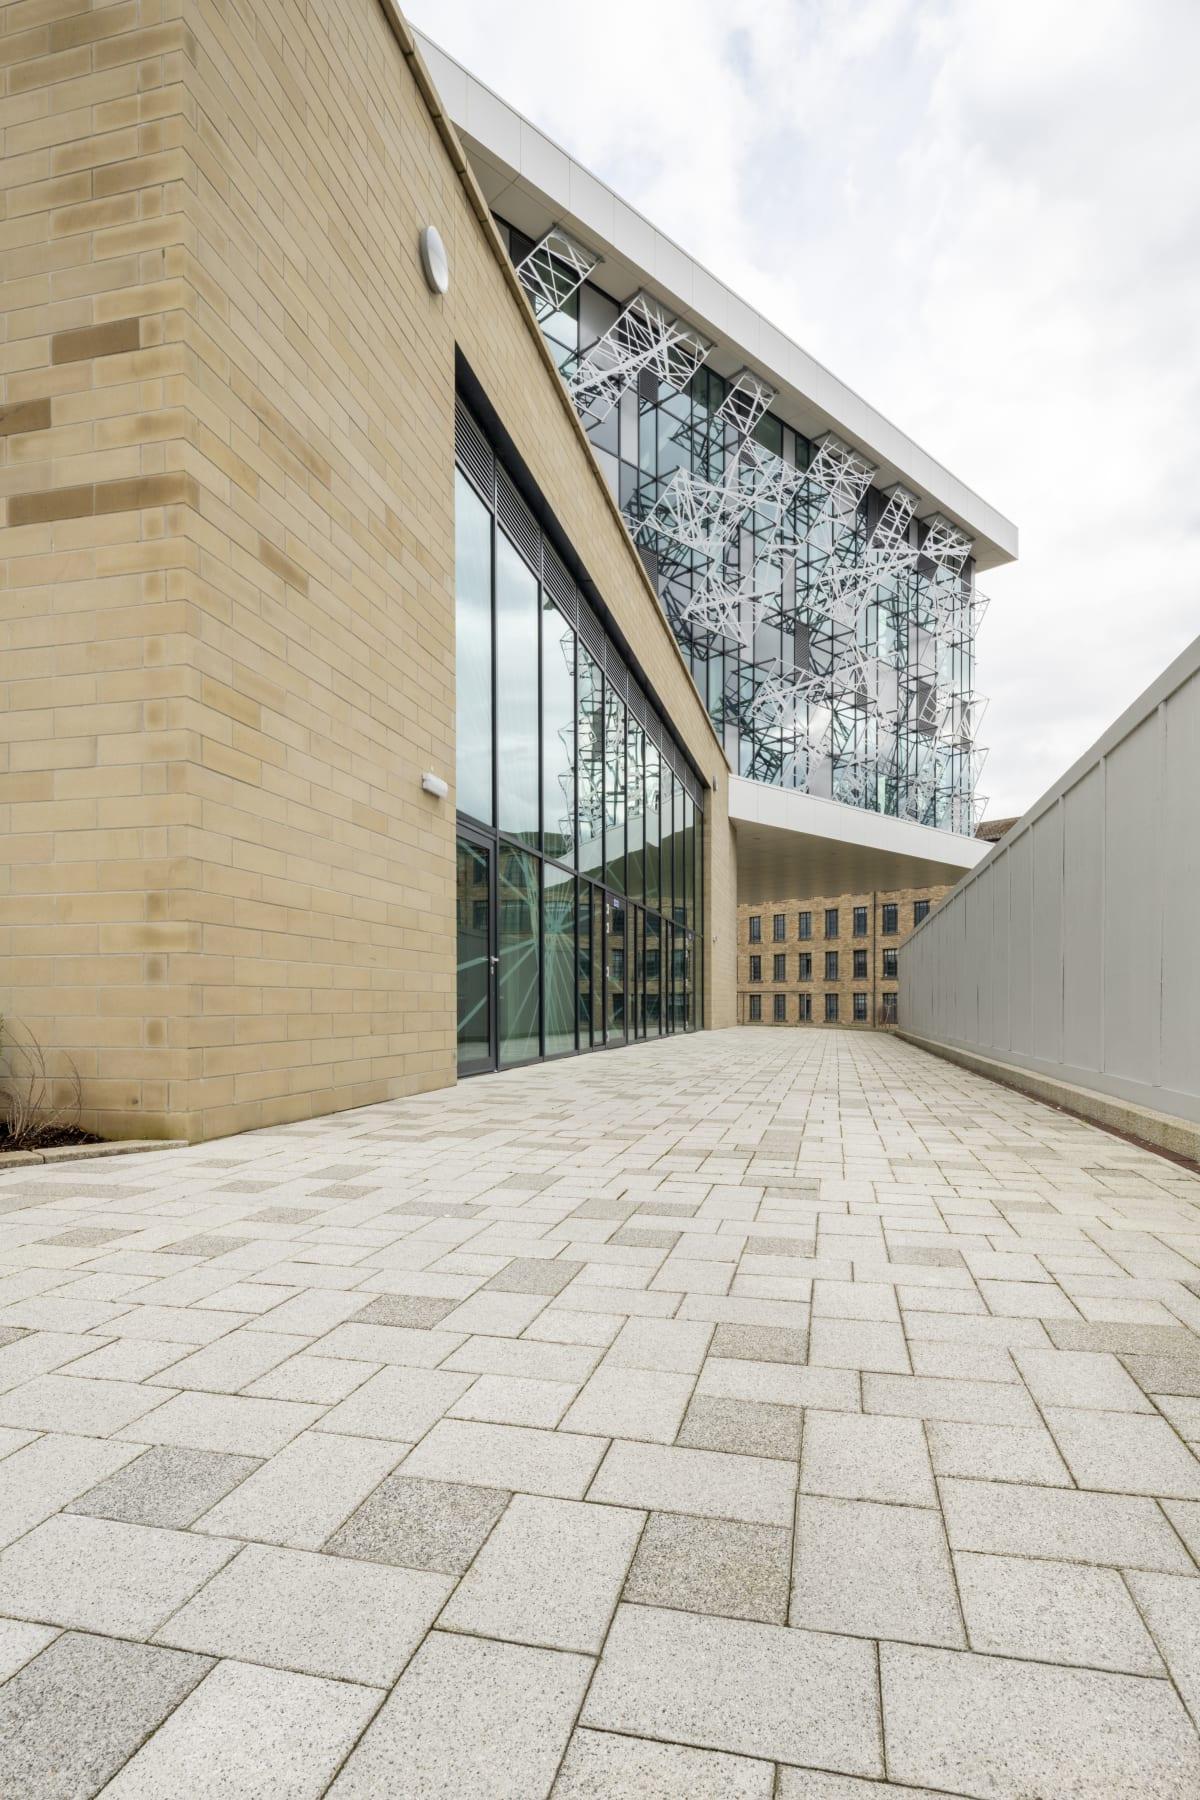 Barbara Hepworth Building, University of Huddersfield